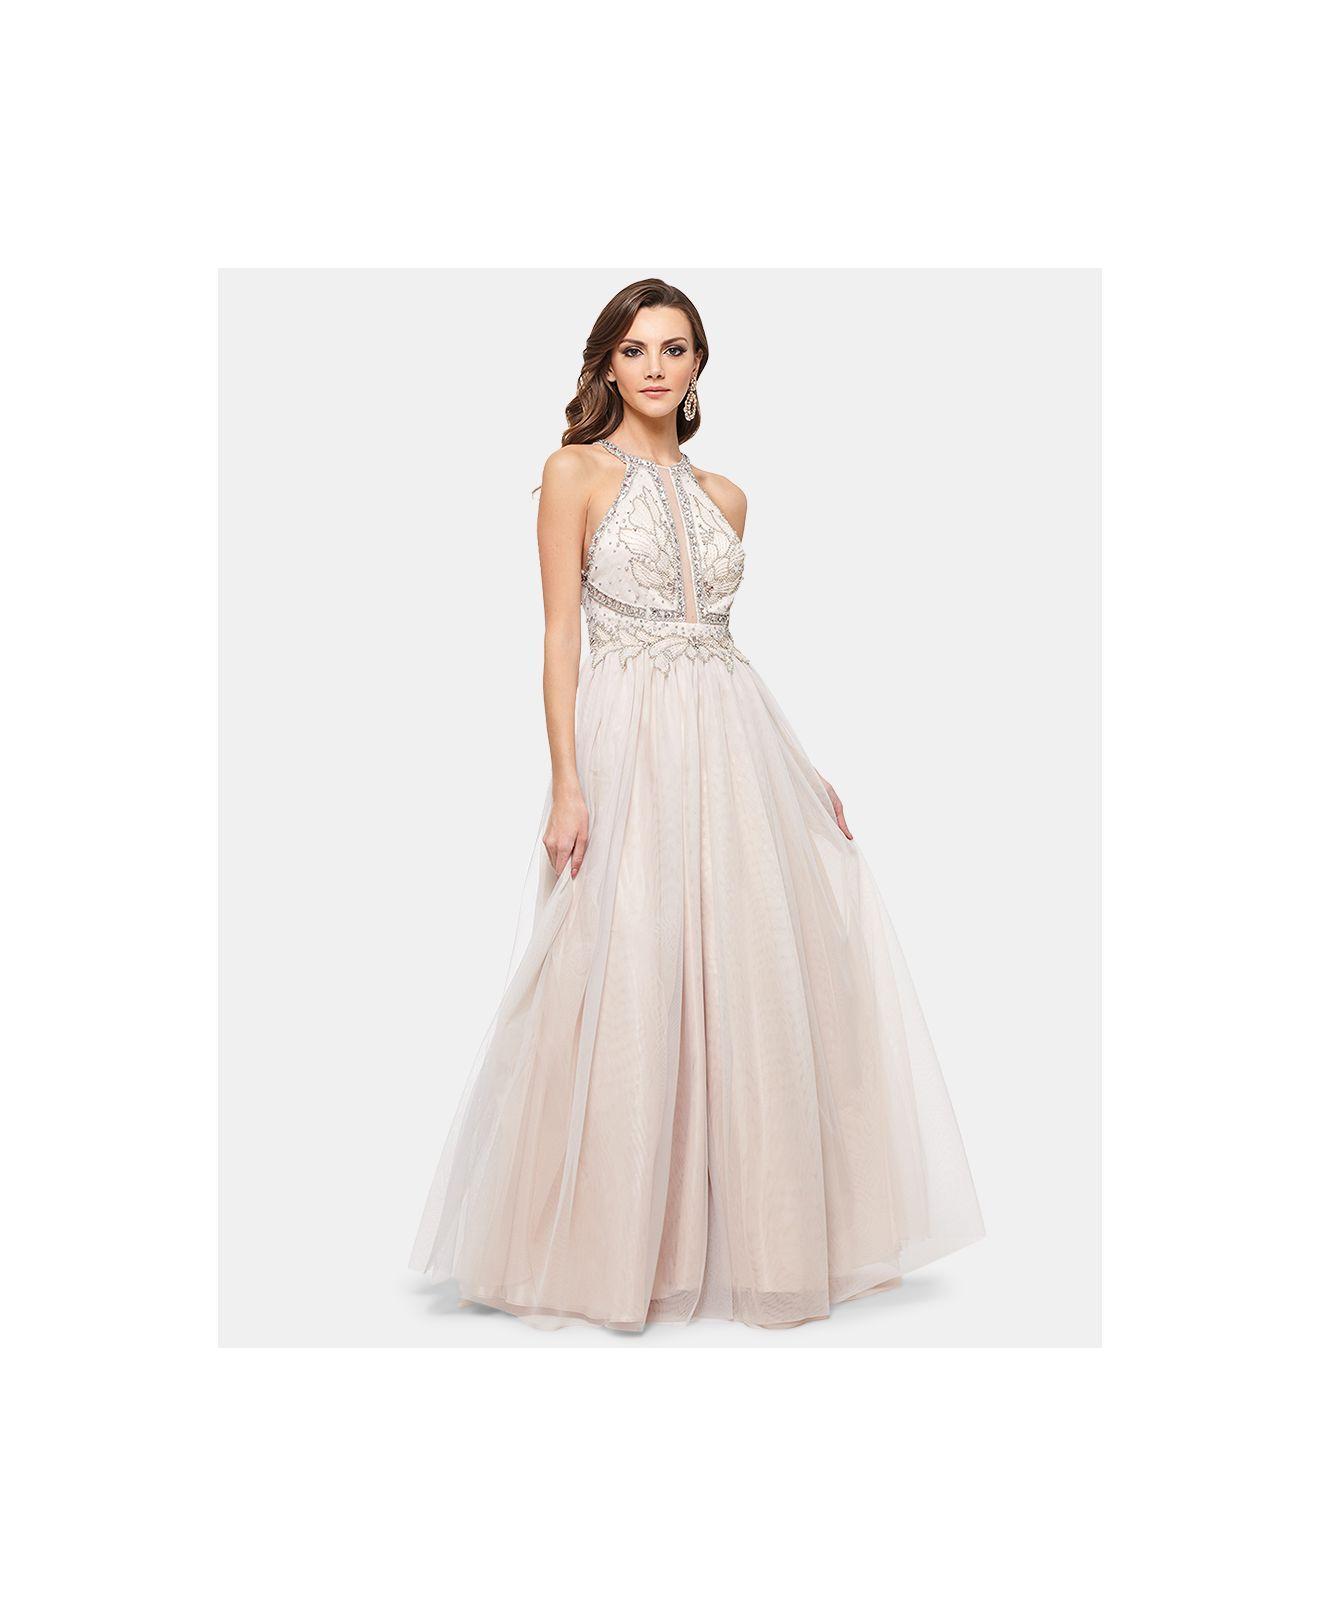 b79a1684487c0 Betsy & Adam Embellished Halter Glitz Ballgown in Pink - Lyst